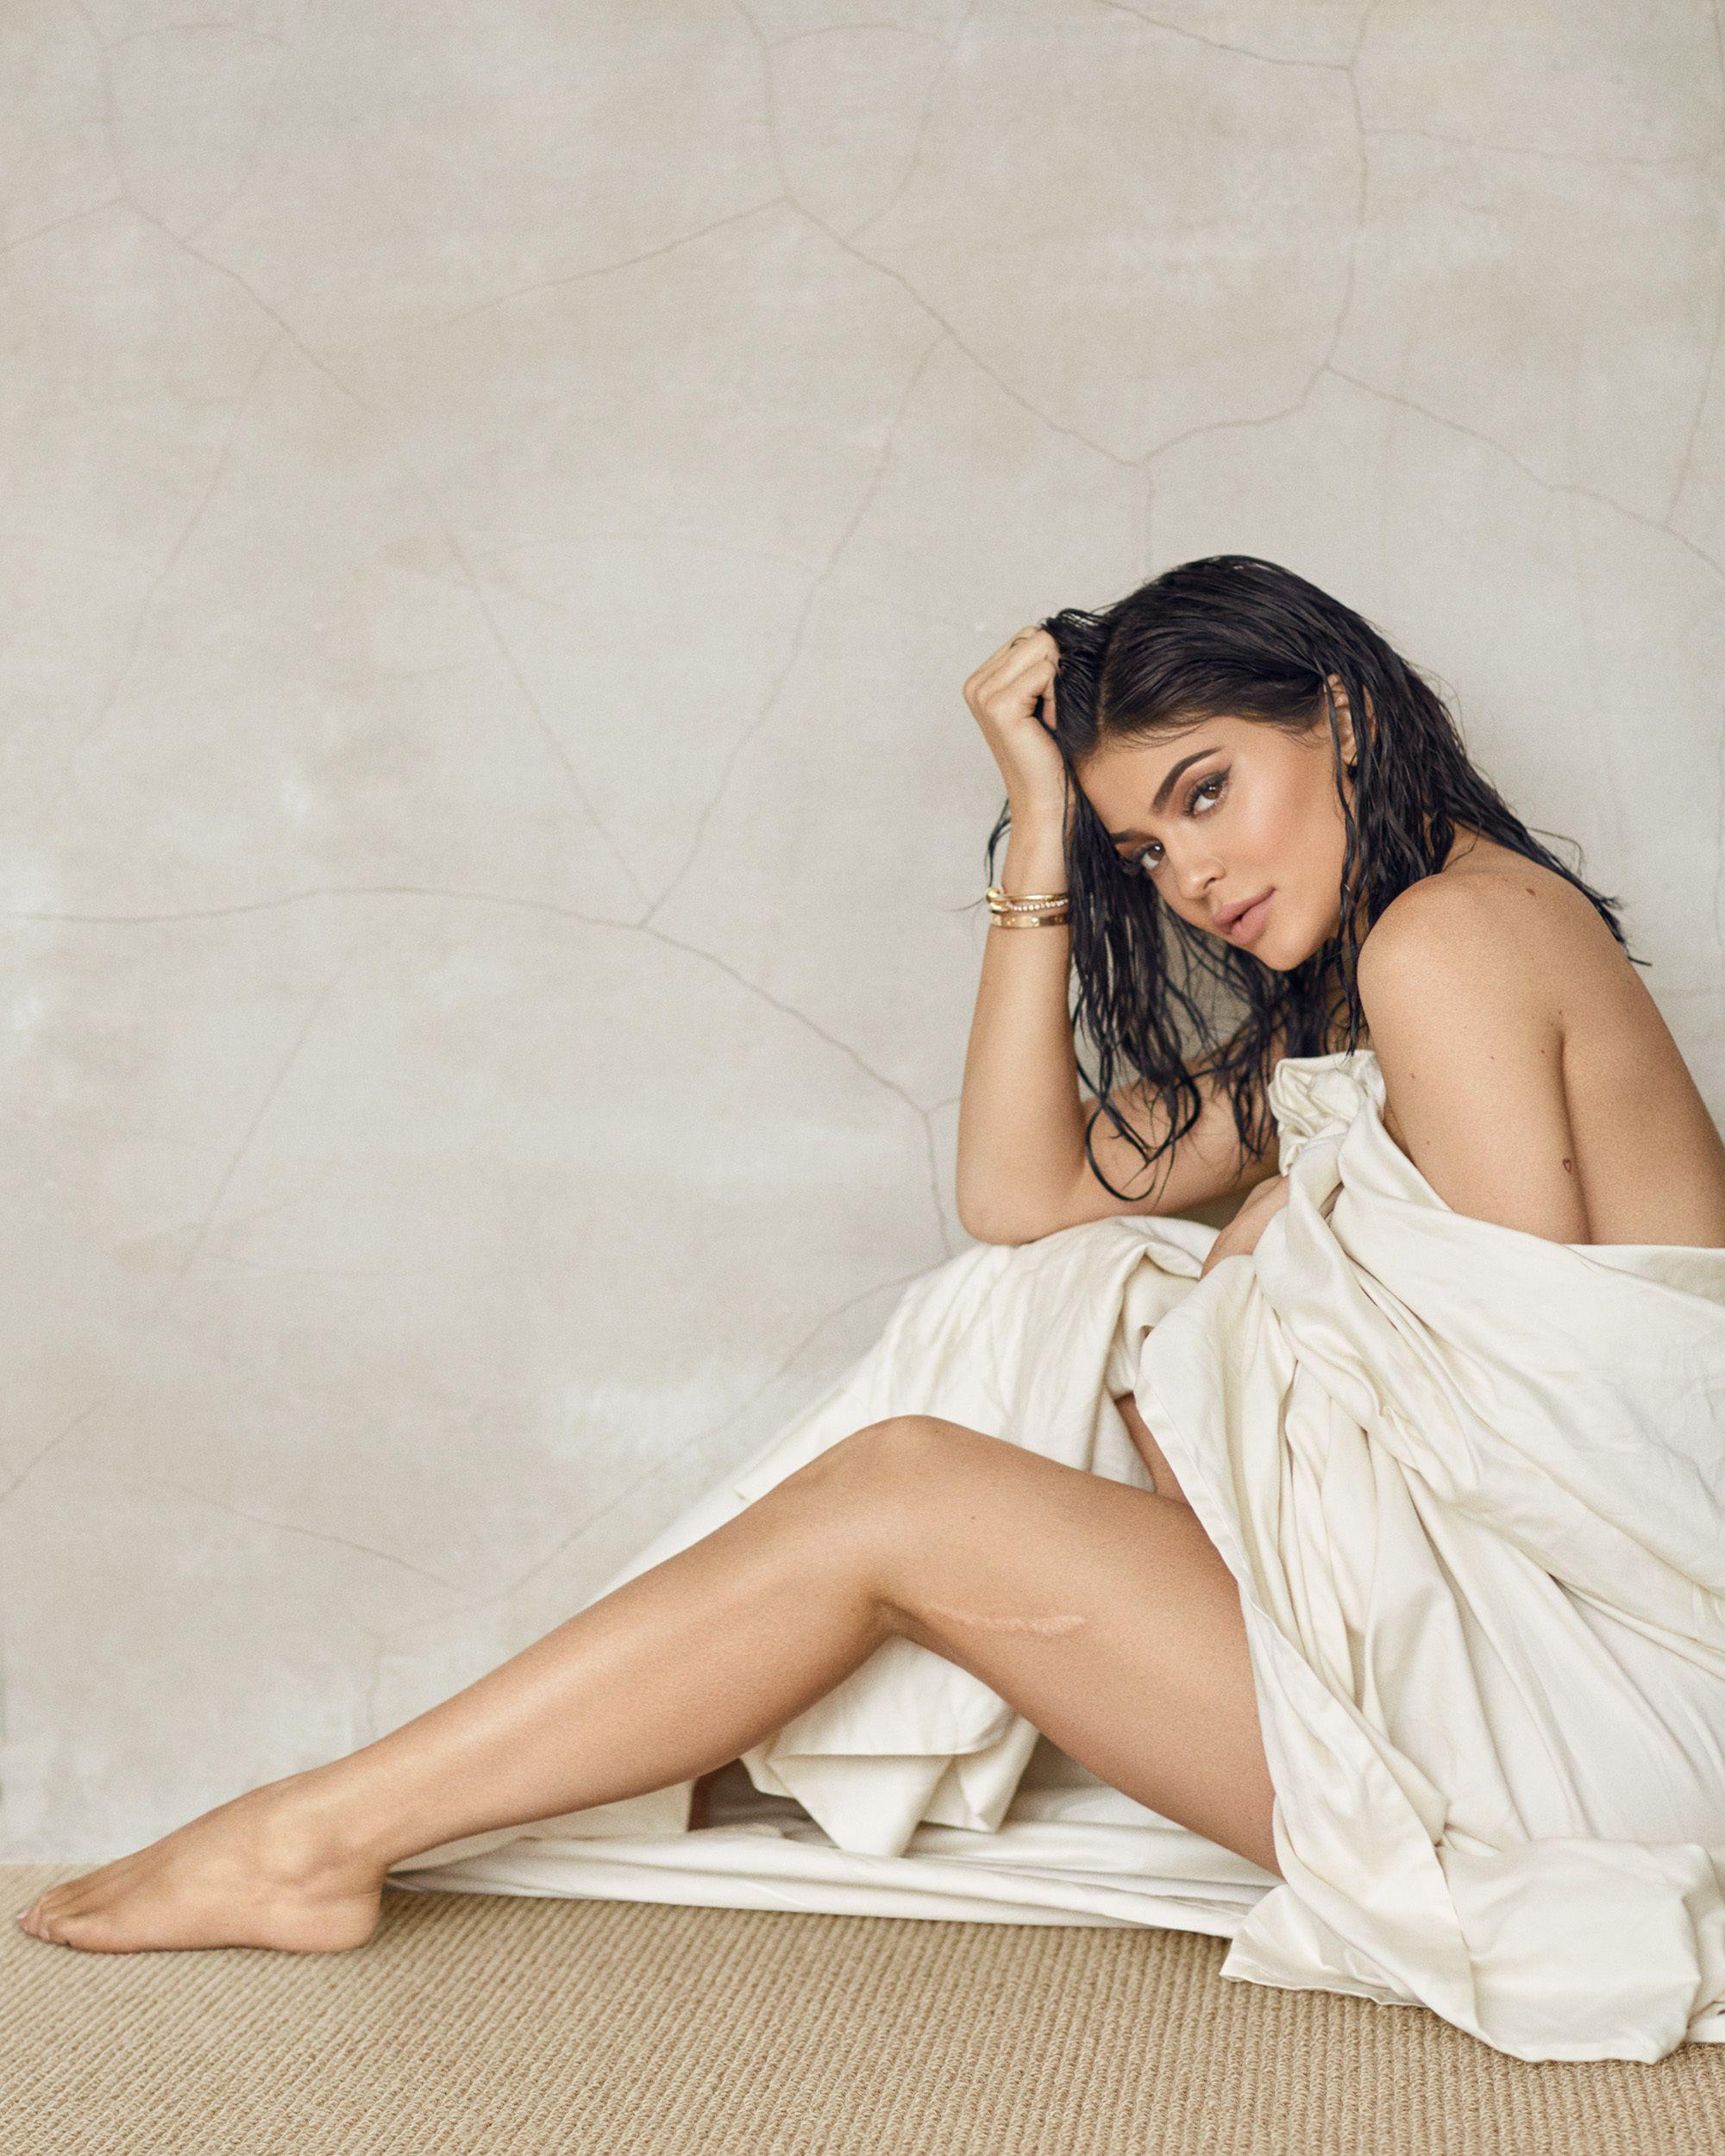 Feet Kylie Jenner Kendall Jenner nudes (34 images), Sideboobs